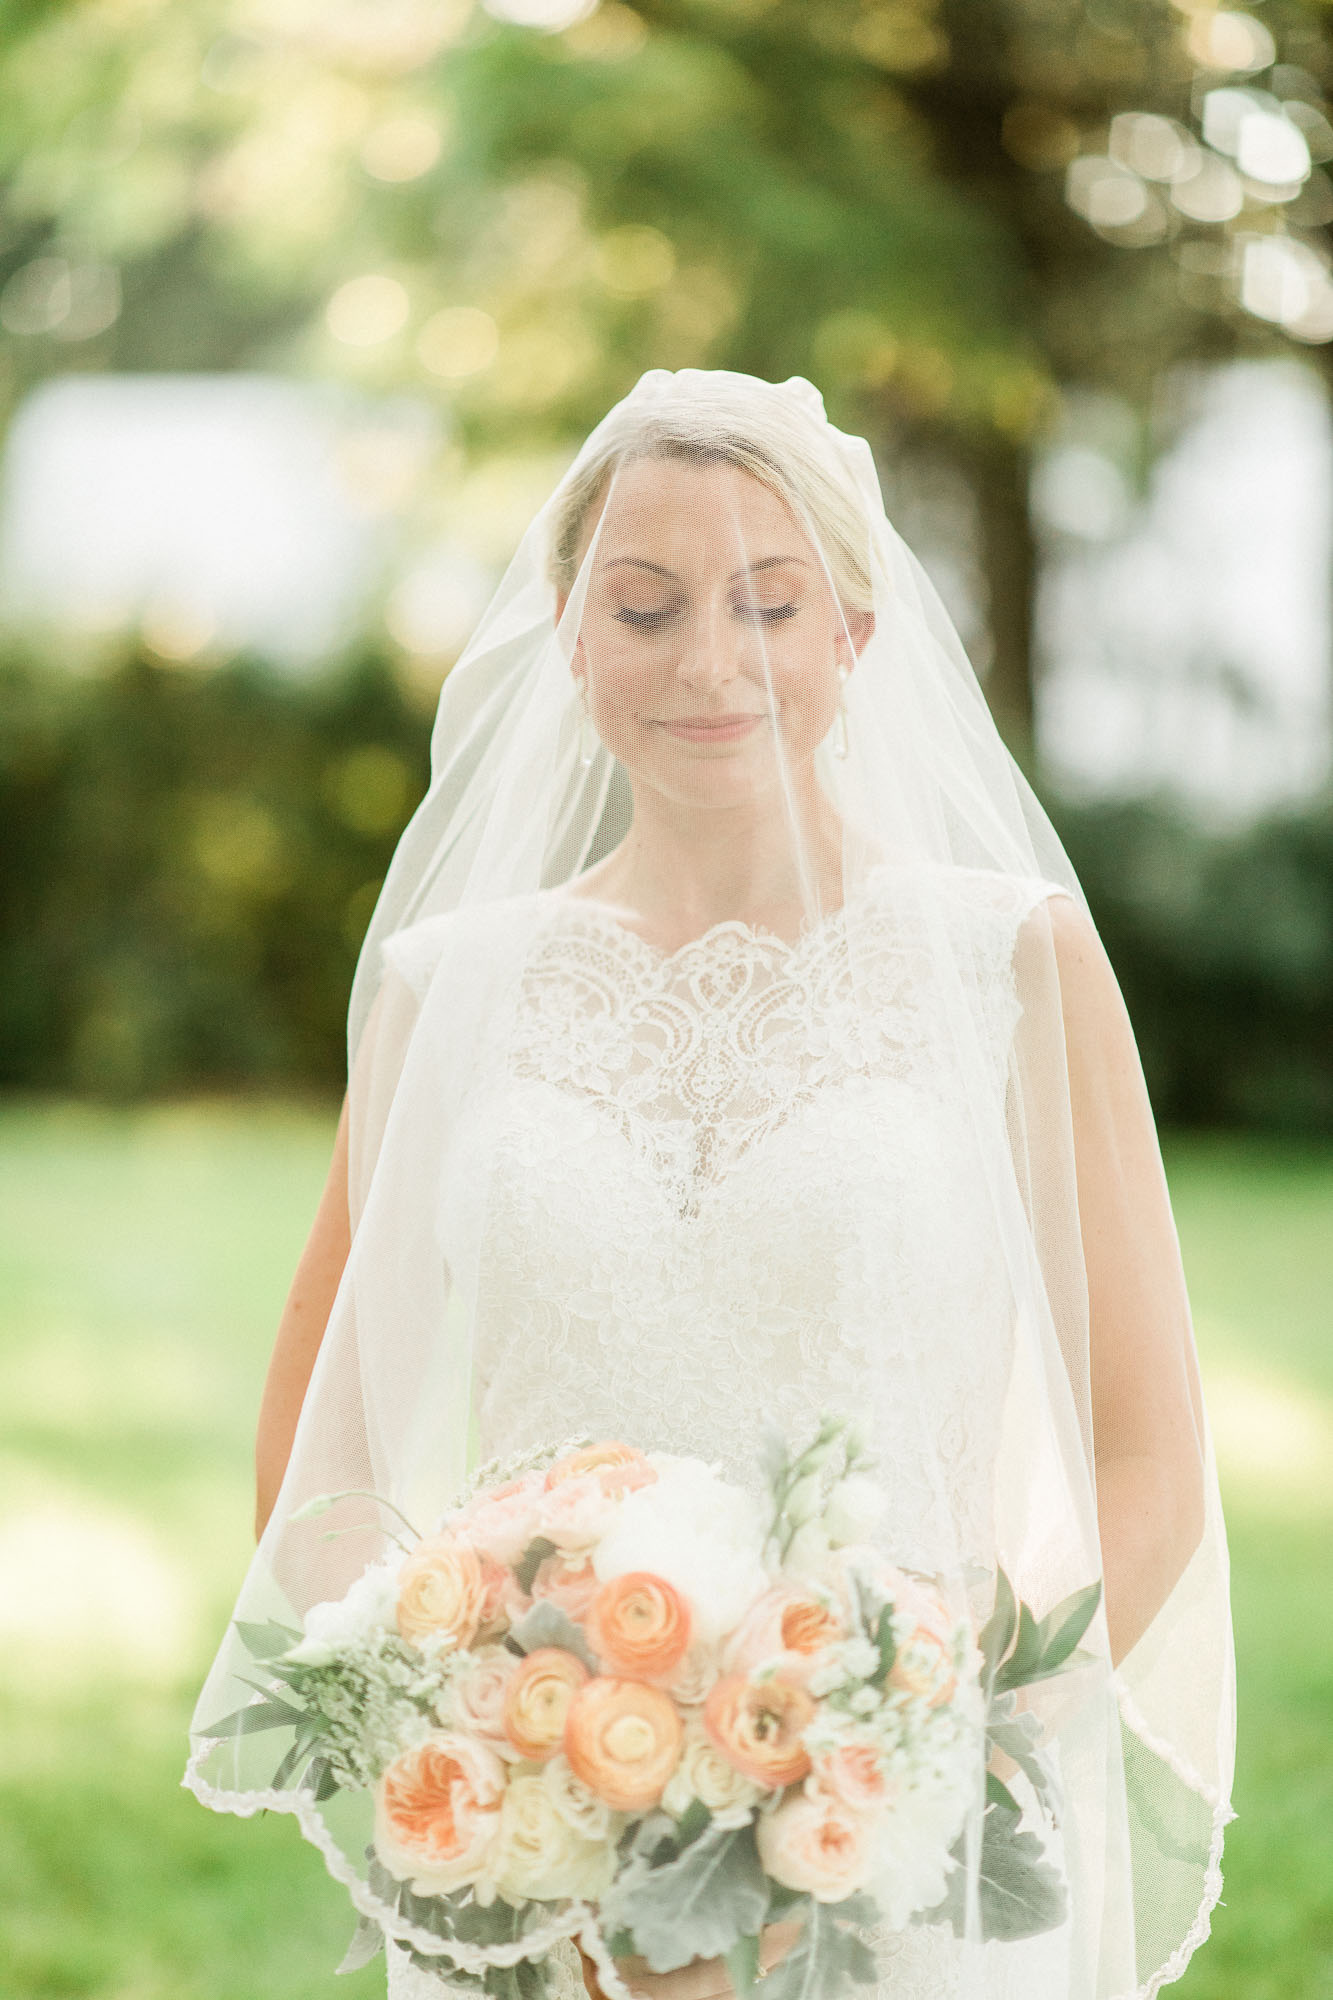 Allenberry-resort-historic-pennsylvania-wedding-22366.jpg